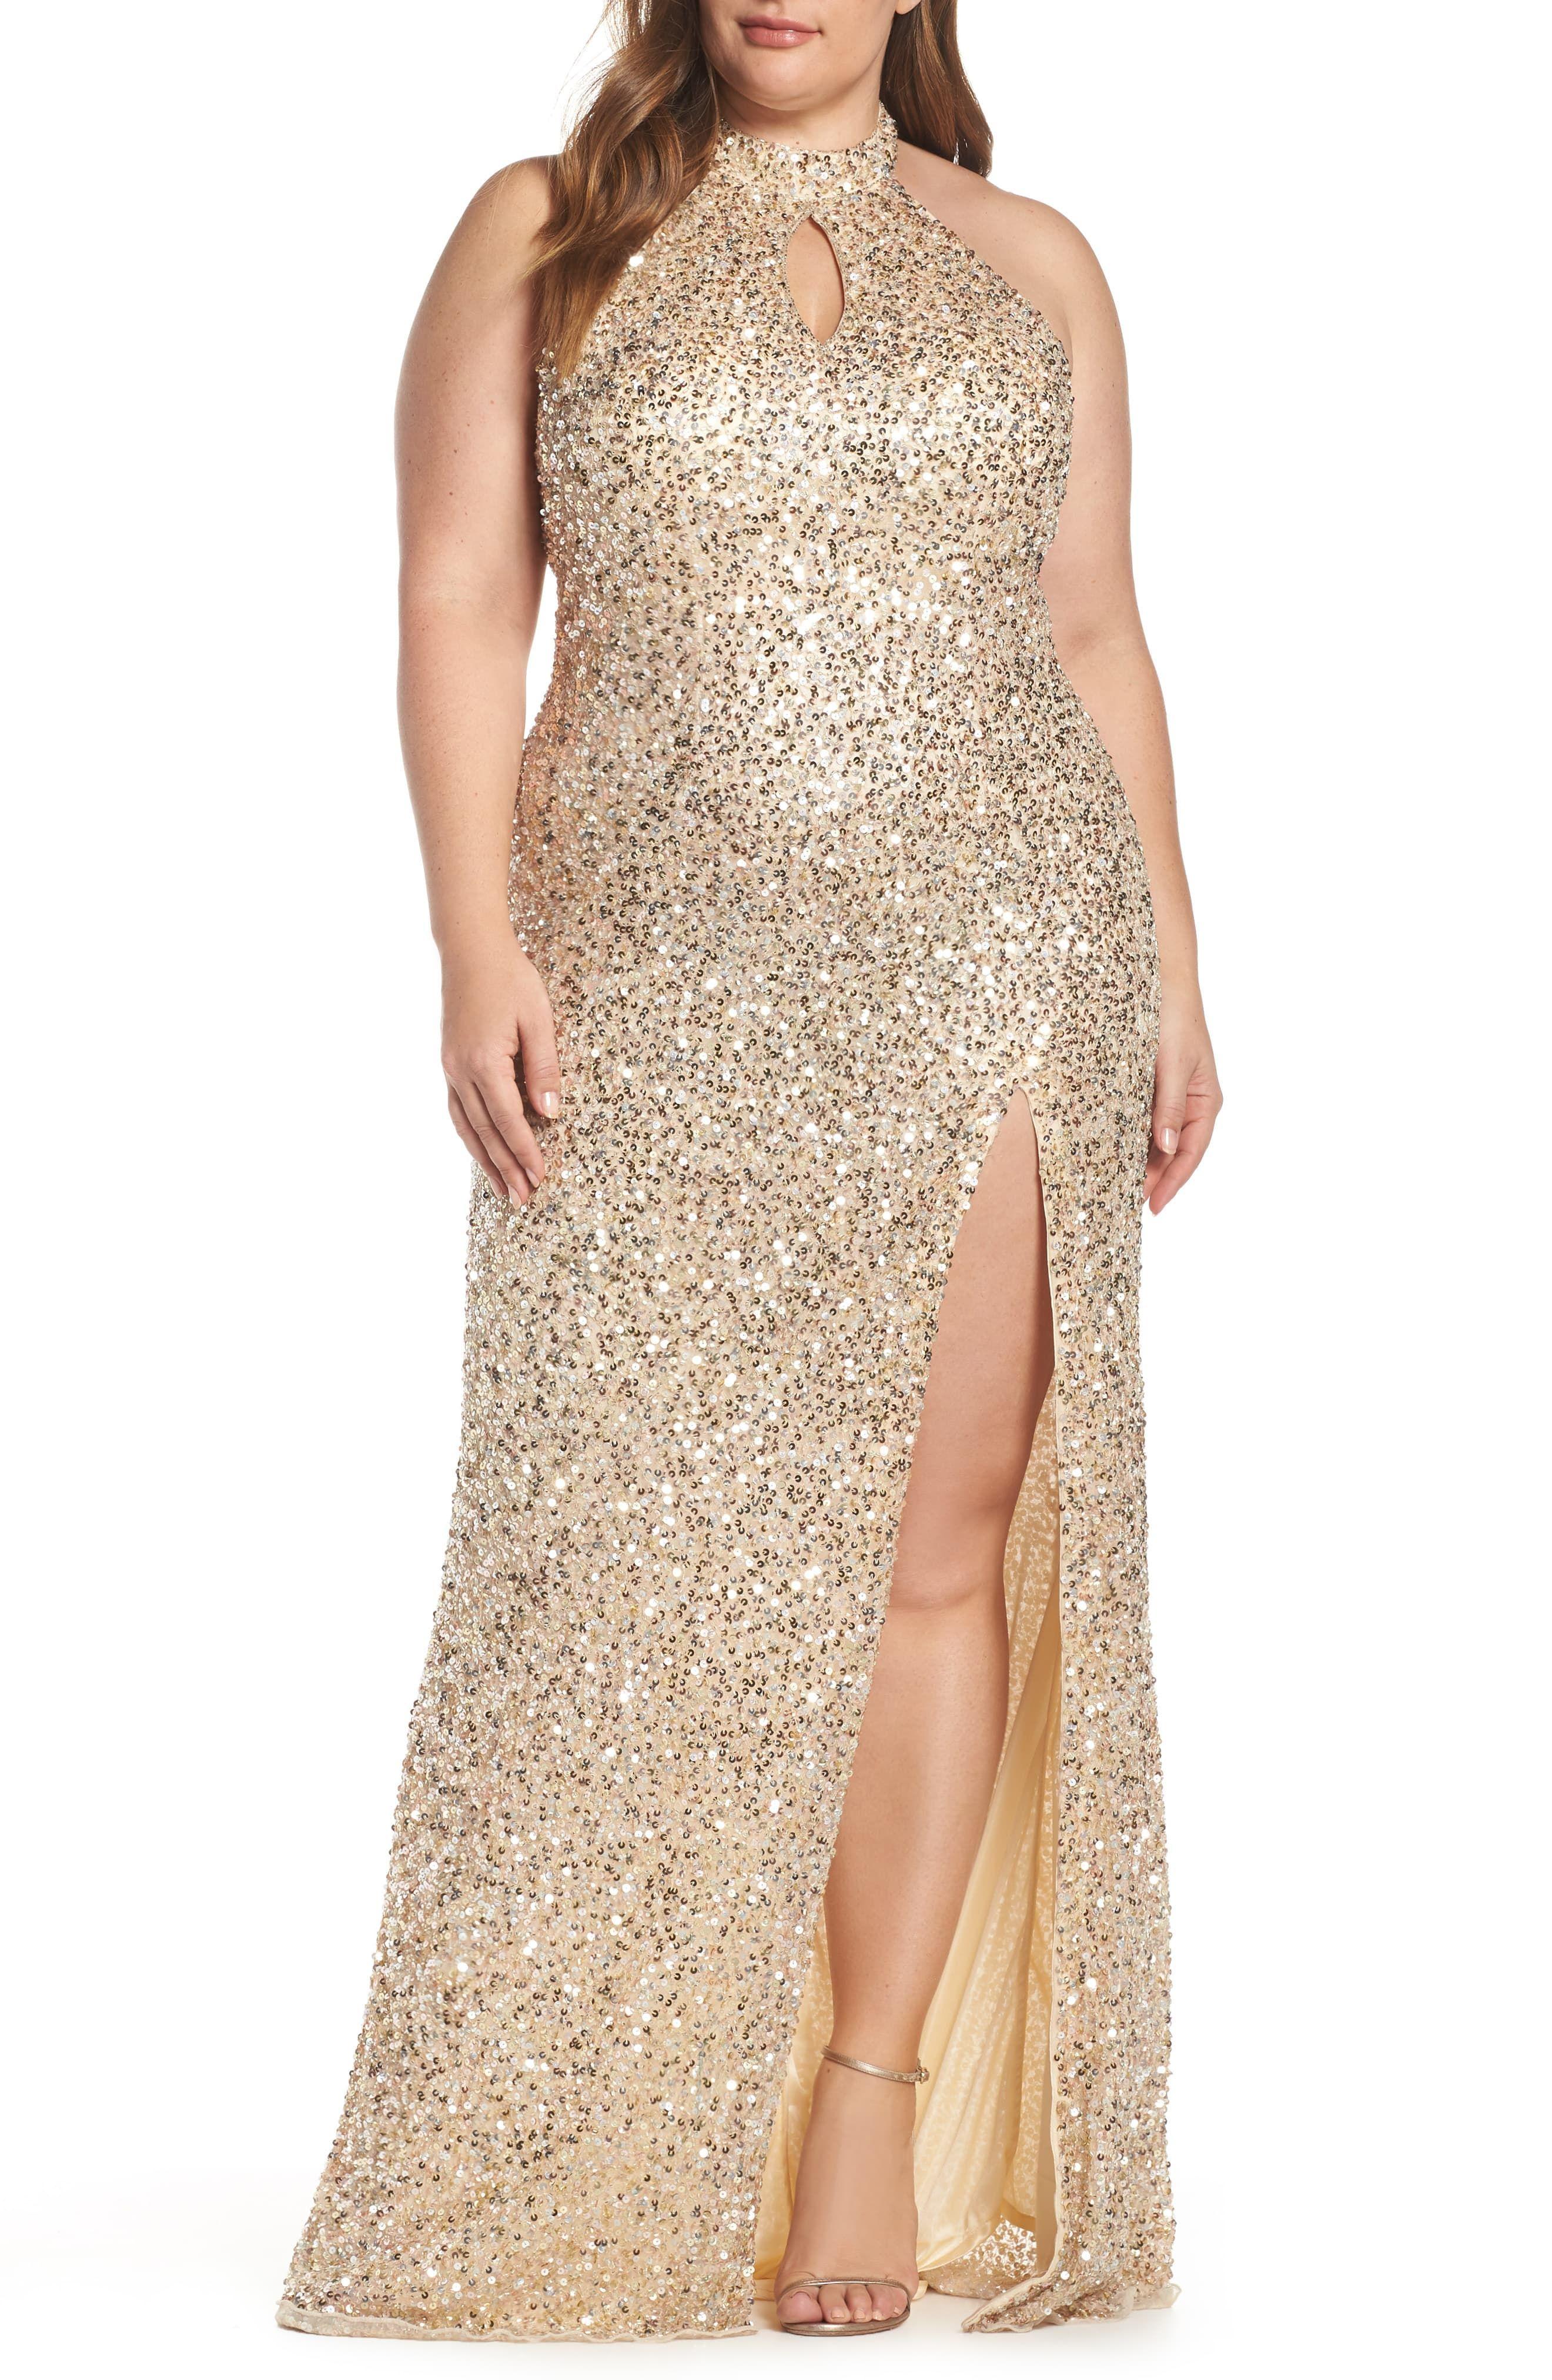 Mac Duggal Sequin Mesh Evening Dress Plus Size Nordstrom In 2021 Evening Dresses Plus Size Evening Dresses Dresses [ 4048 x 2640 Pixel ]